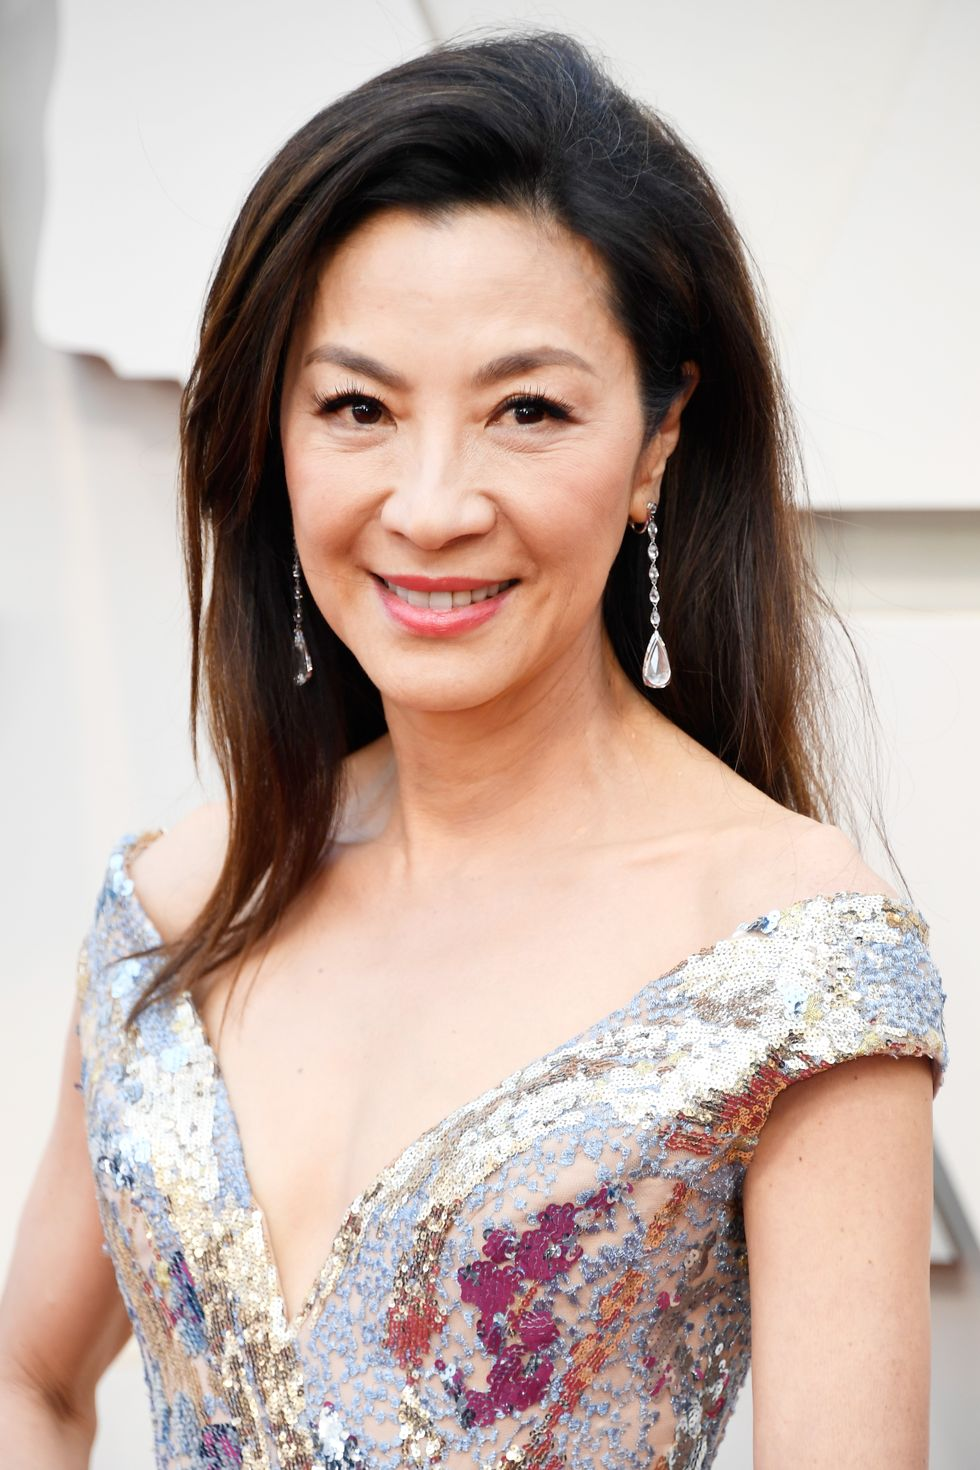 NOW: Michelle Yeoh